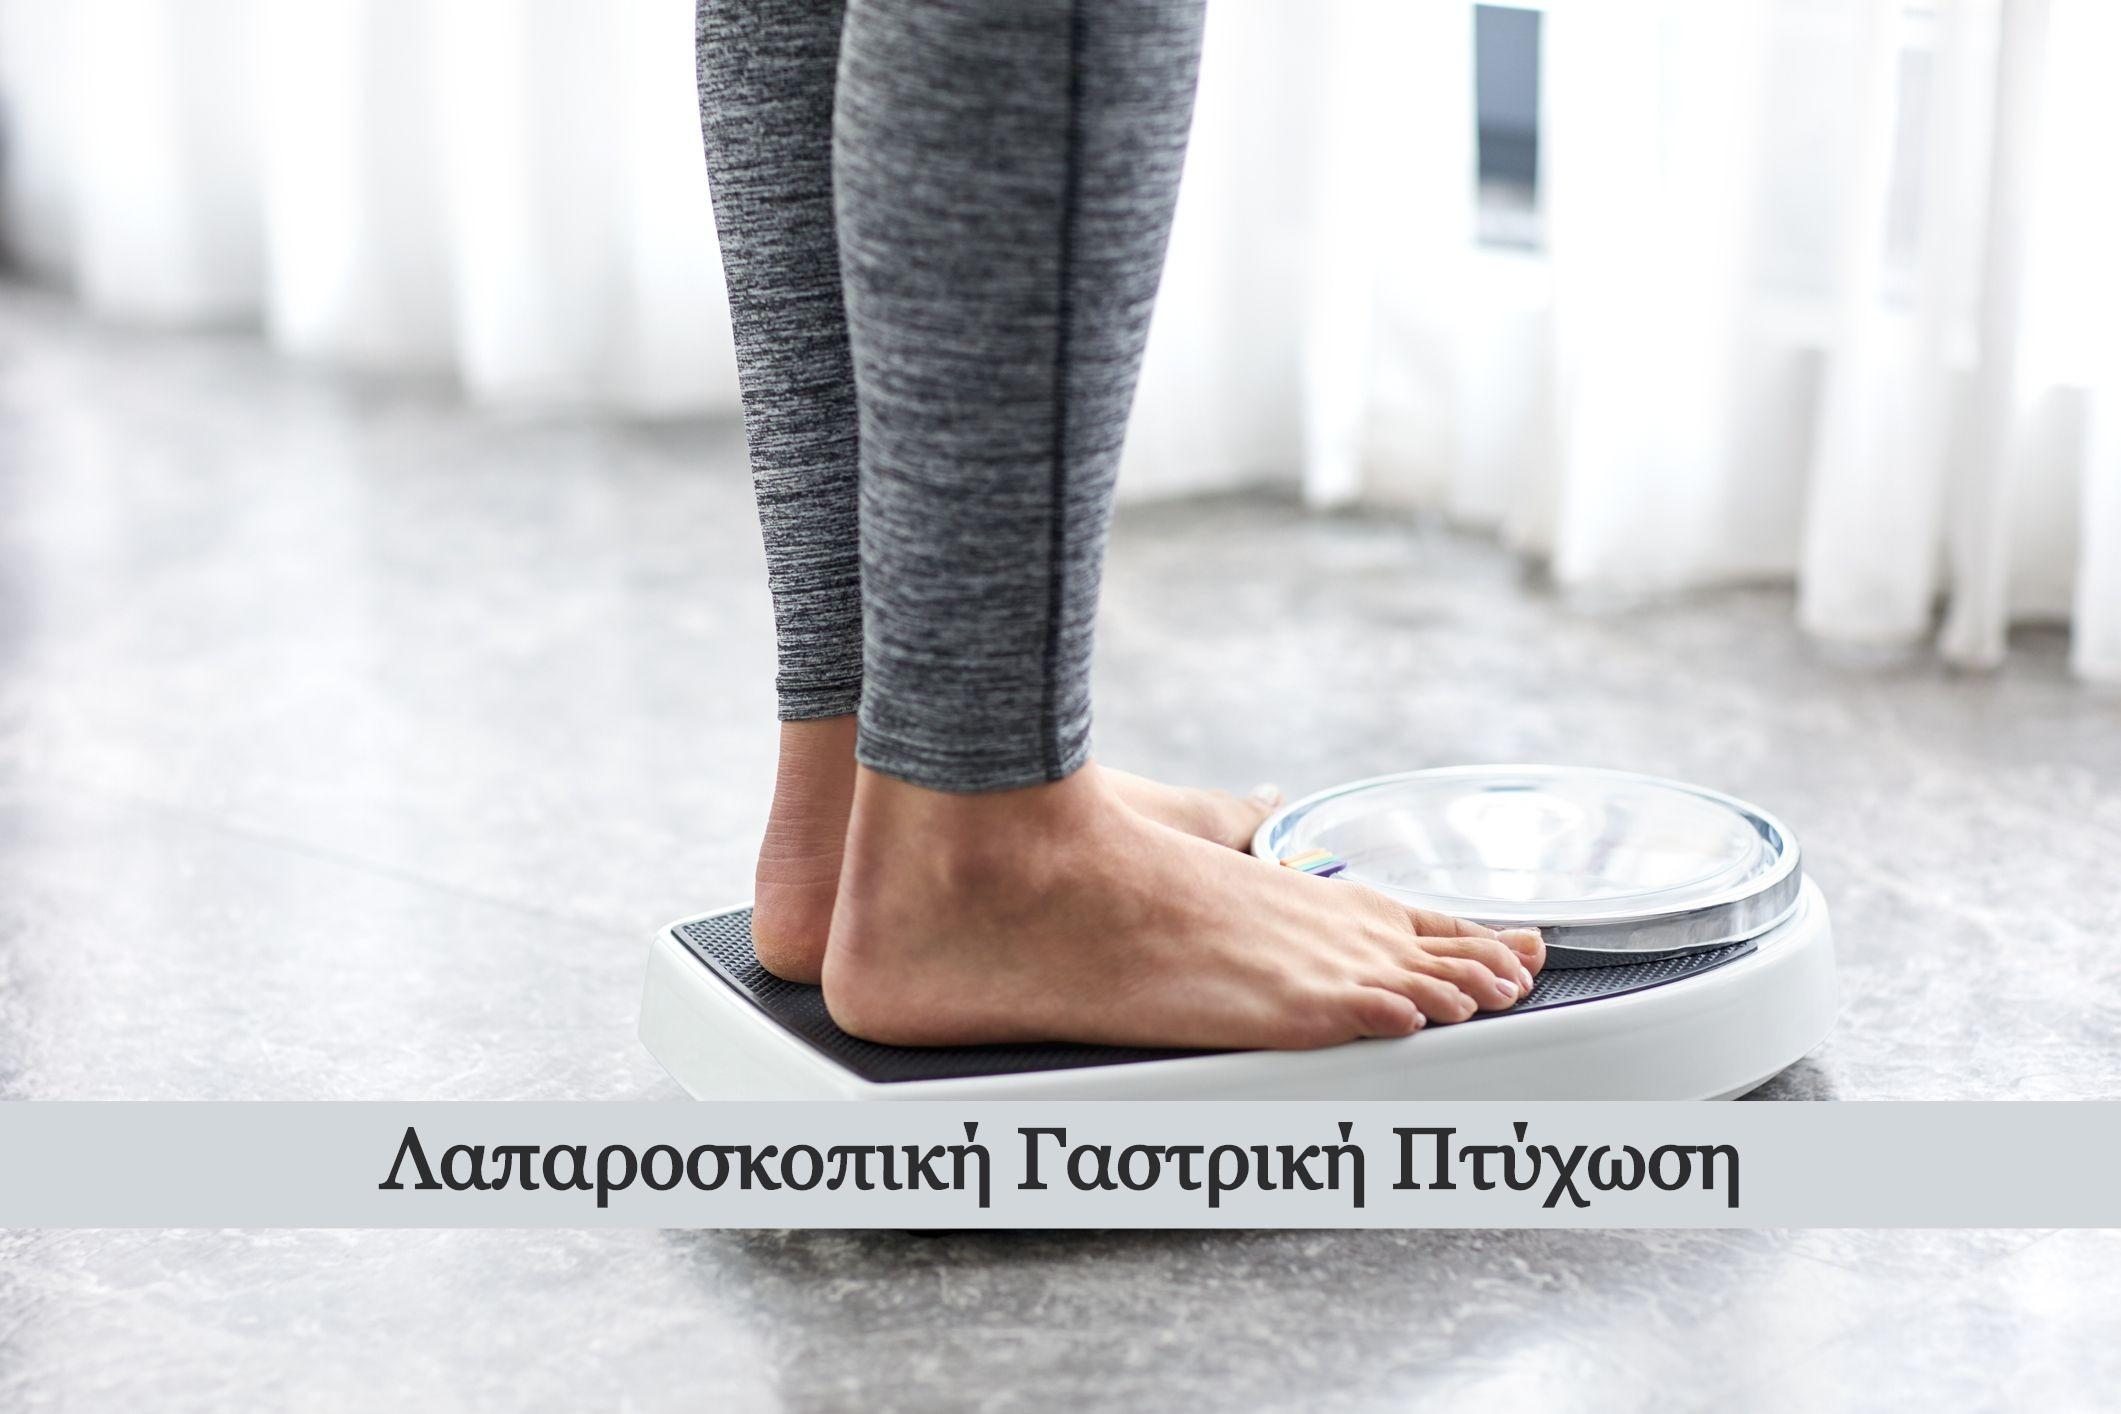 laparoskopiki-gastriki-ptychosi_edited